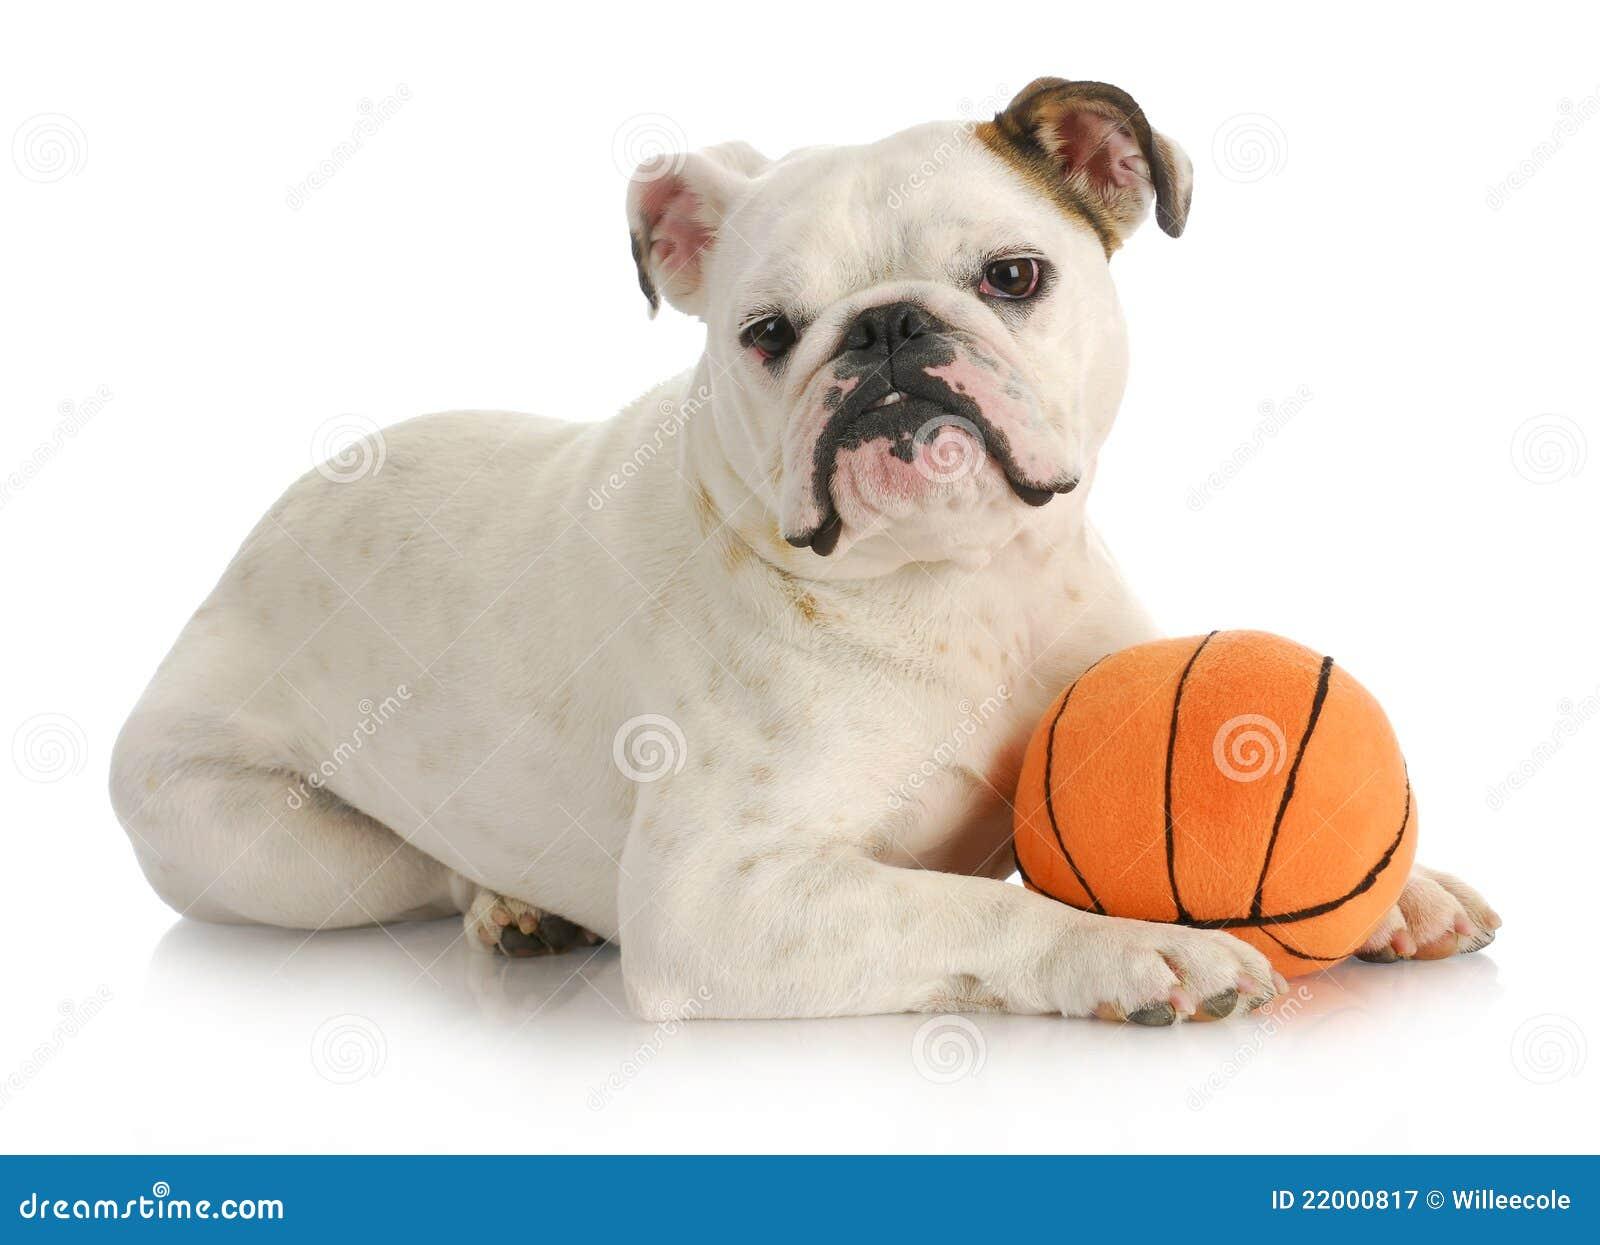 dog with ball royalty free stock photography image 22000817 english bulldog clipart free english bulldog clipart black and white